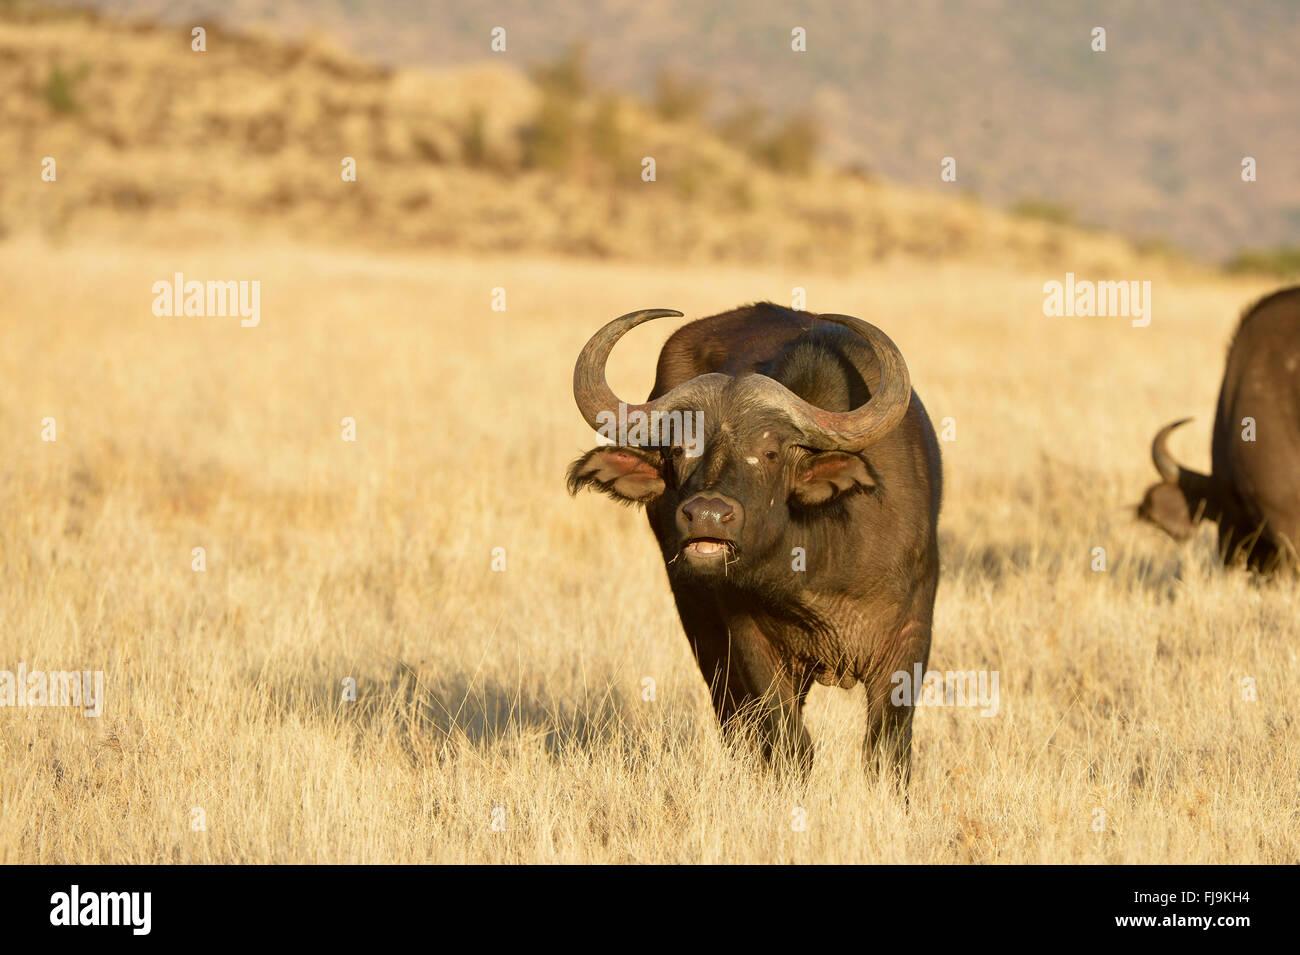 Buffle d'Afrique (Syncerus caffer) adulte consommant de l'herbe sèche, Lewa Wildlife Conservancy, Kenya, Photo Stock